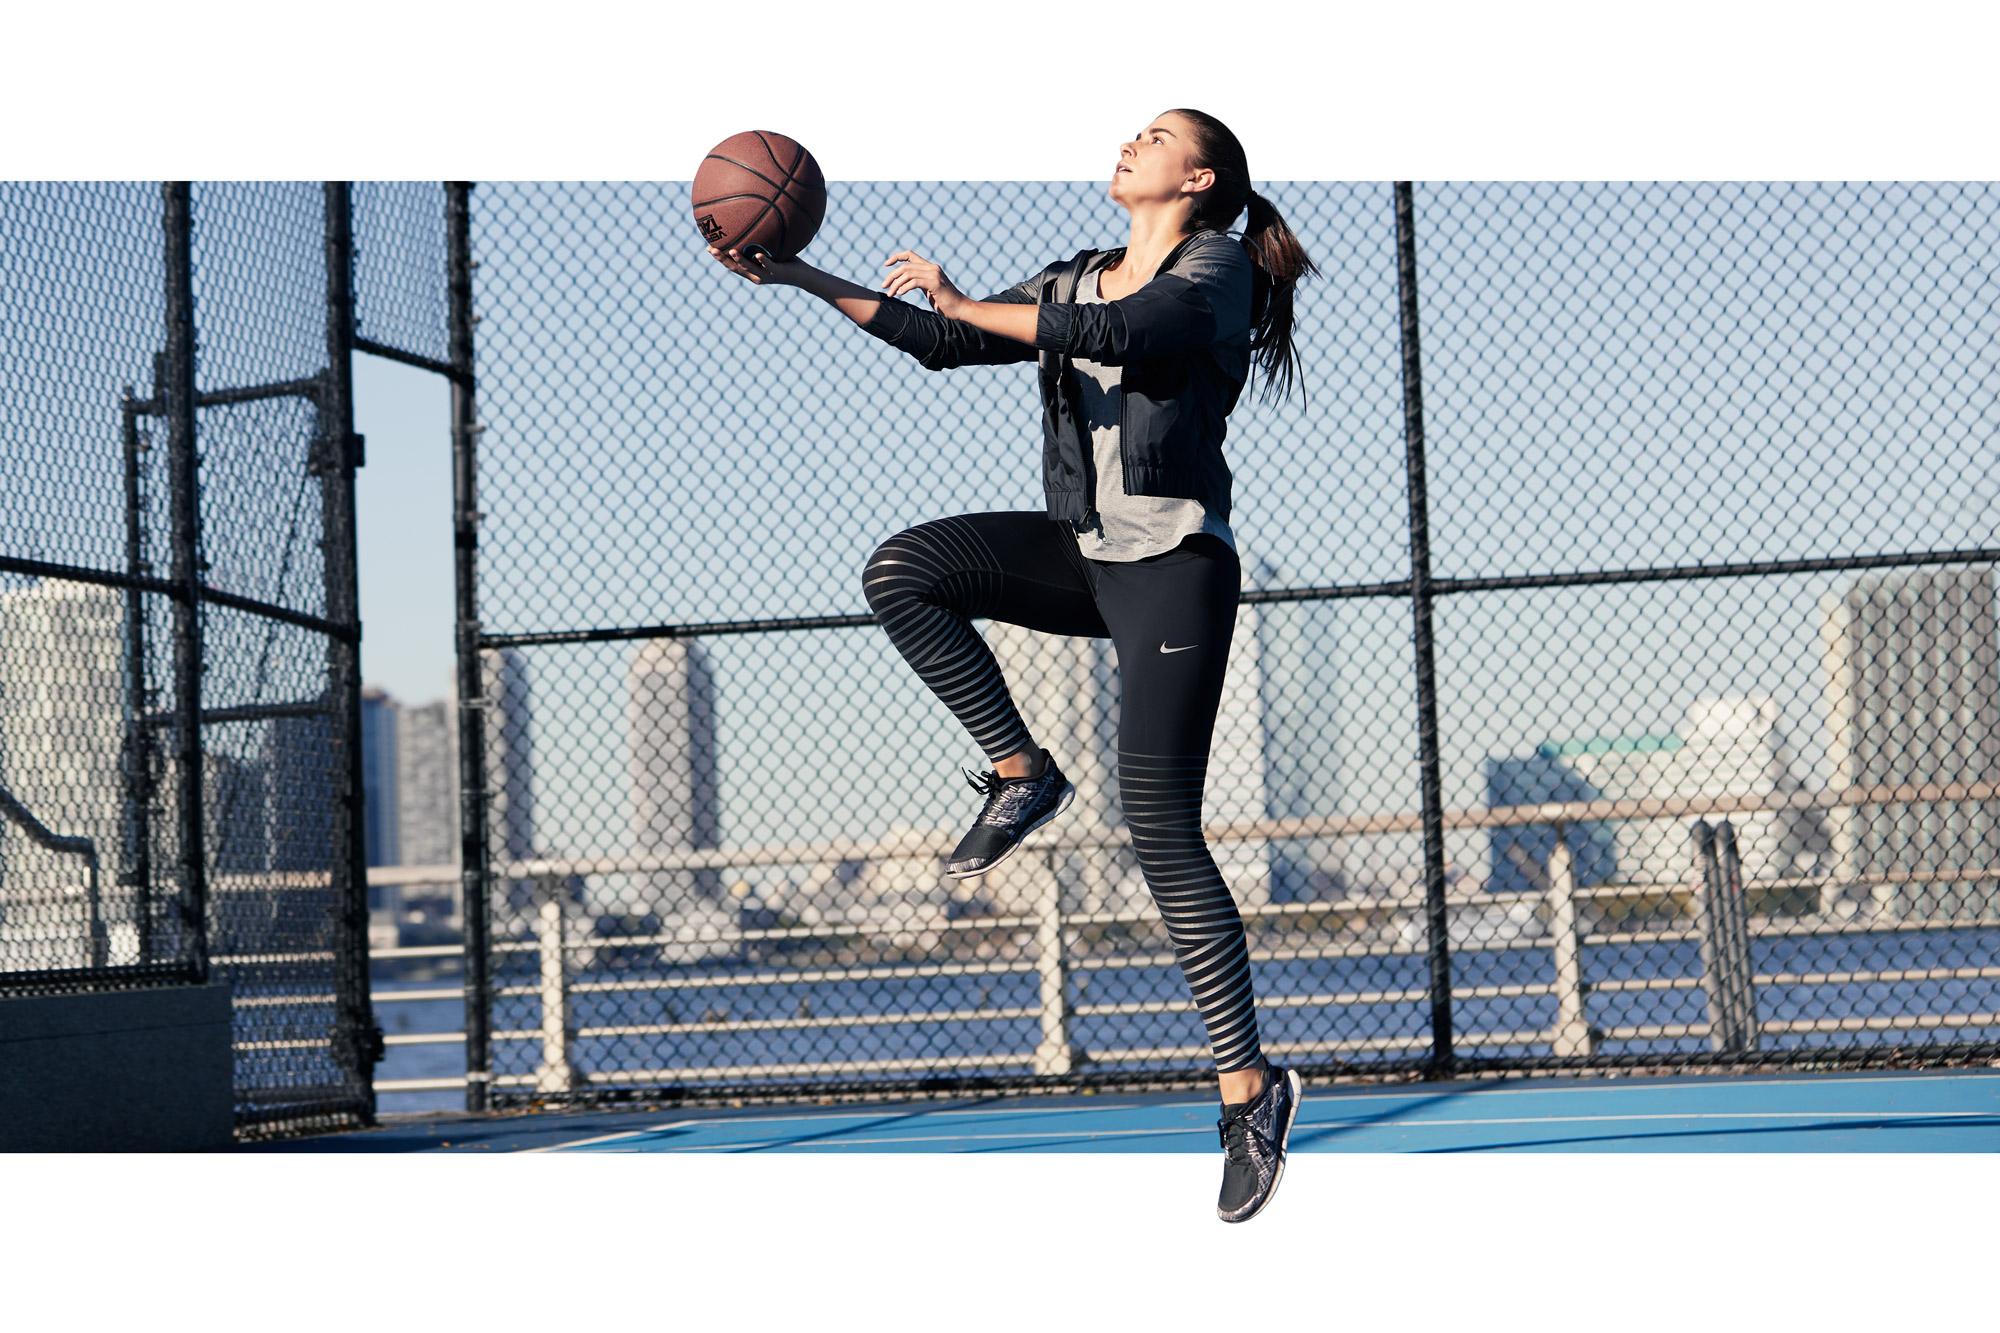 basketball-urban-waterfront-NYC-nike.jpg